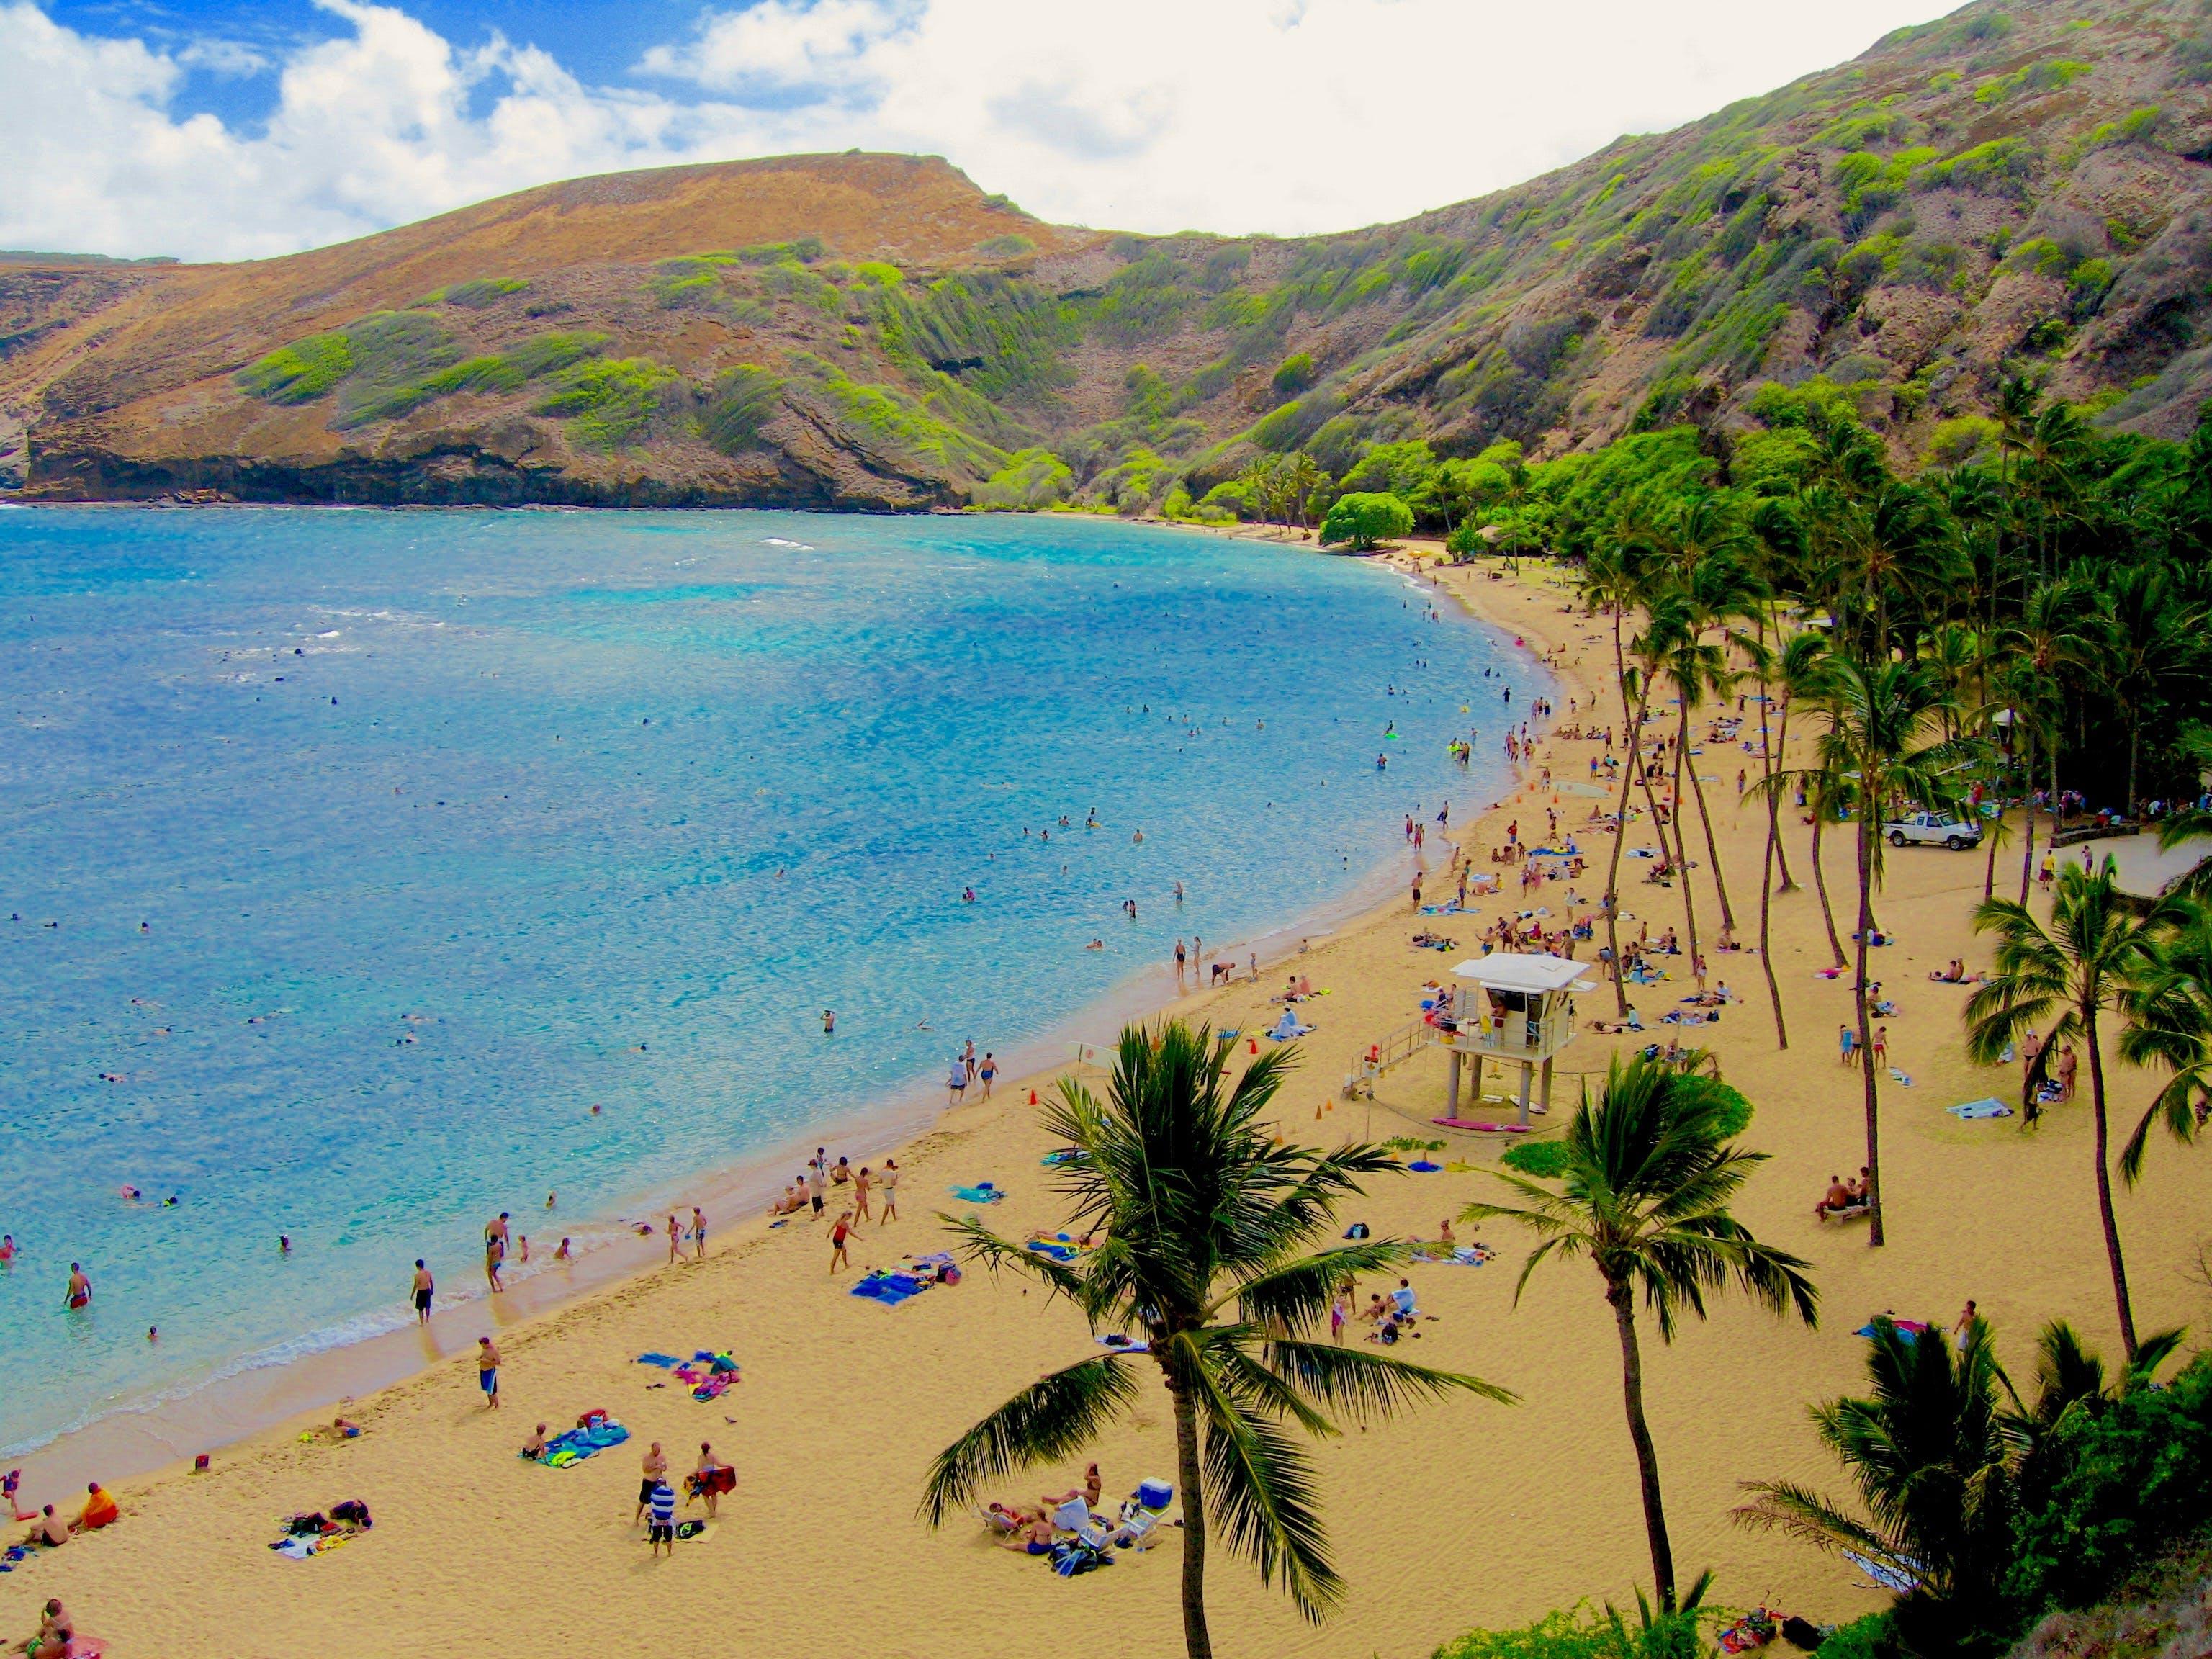 Free stock photo of beach, palm trees, reef, sand beach